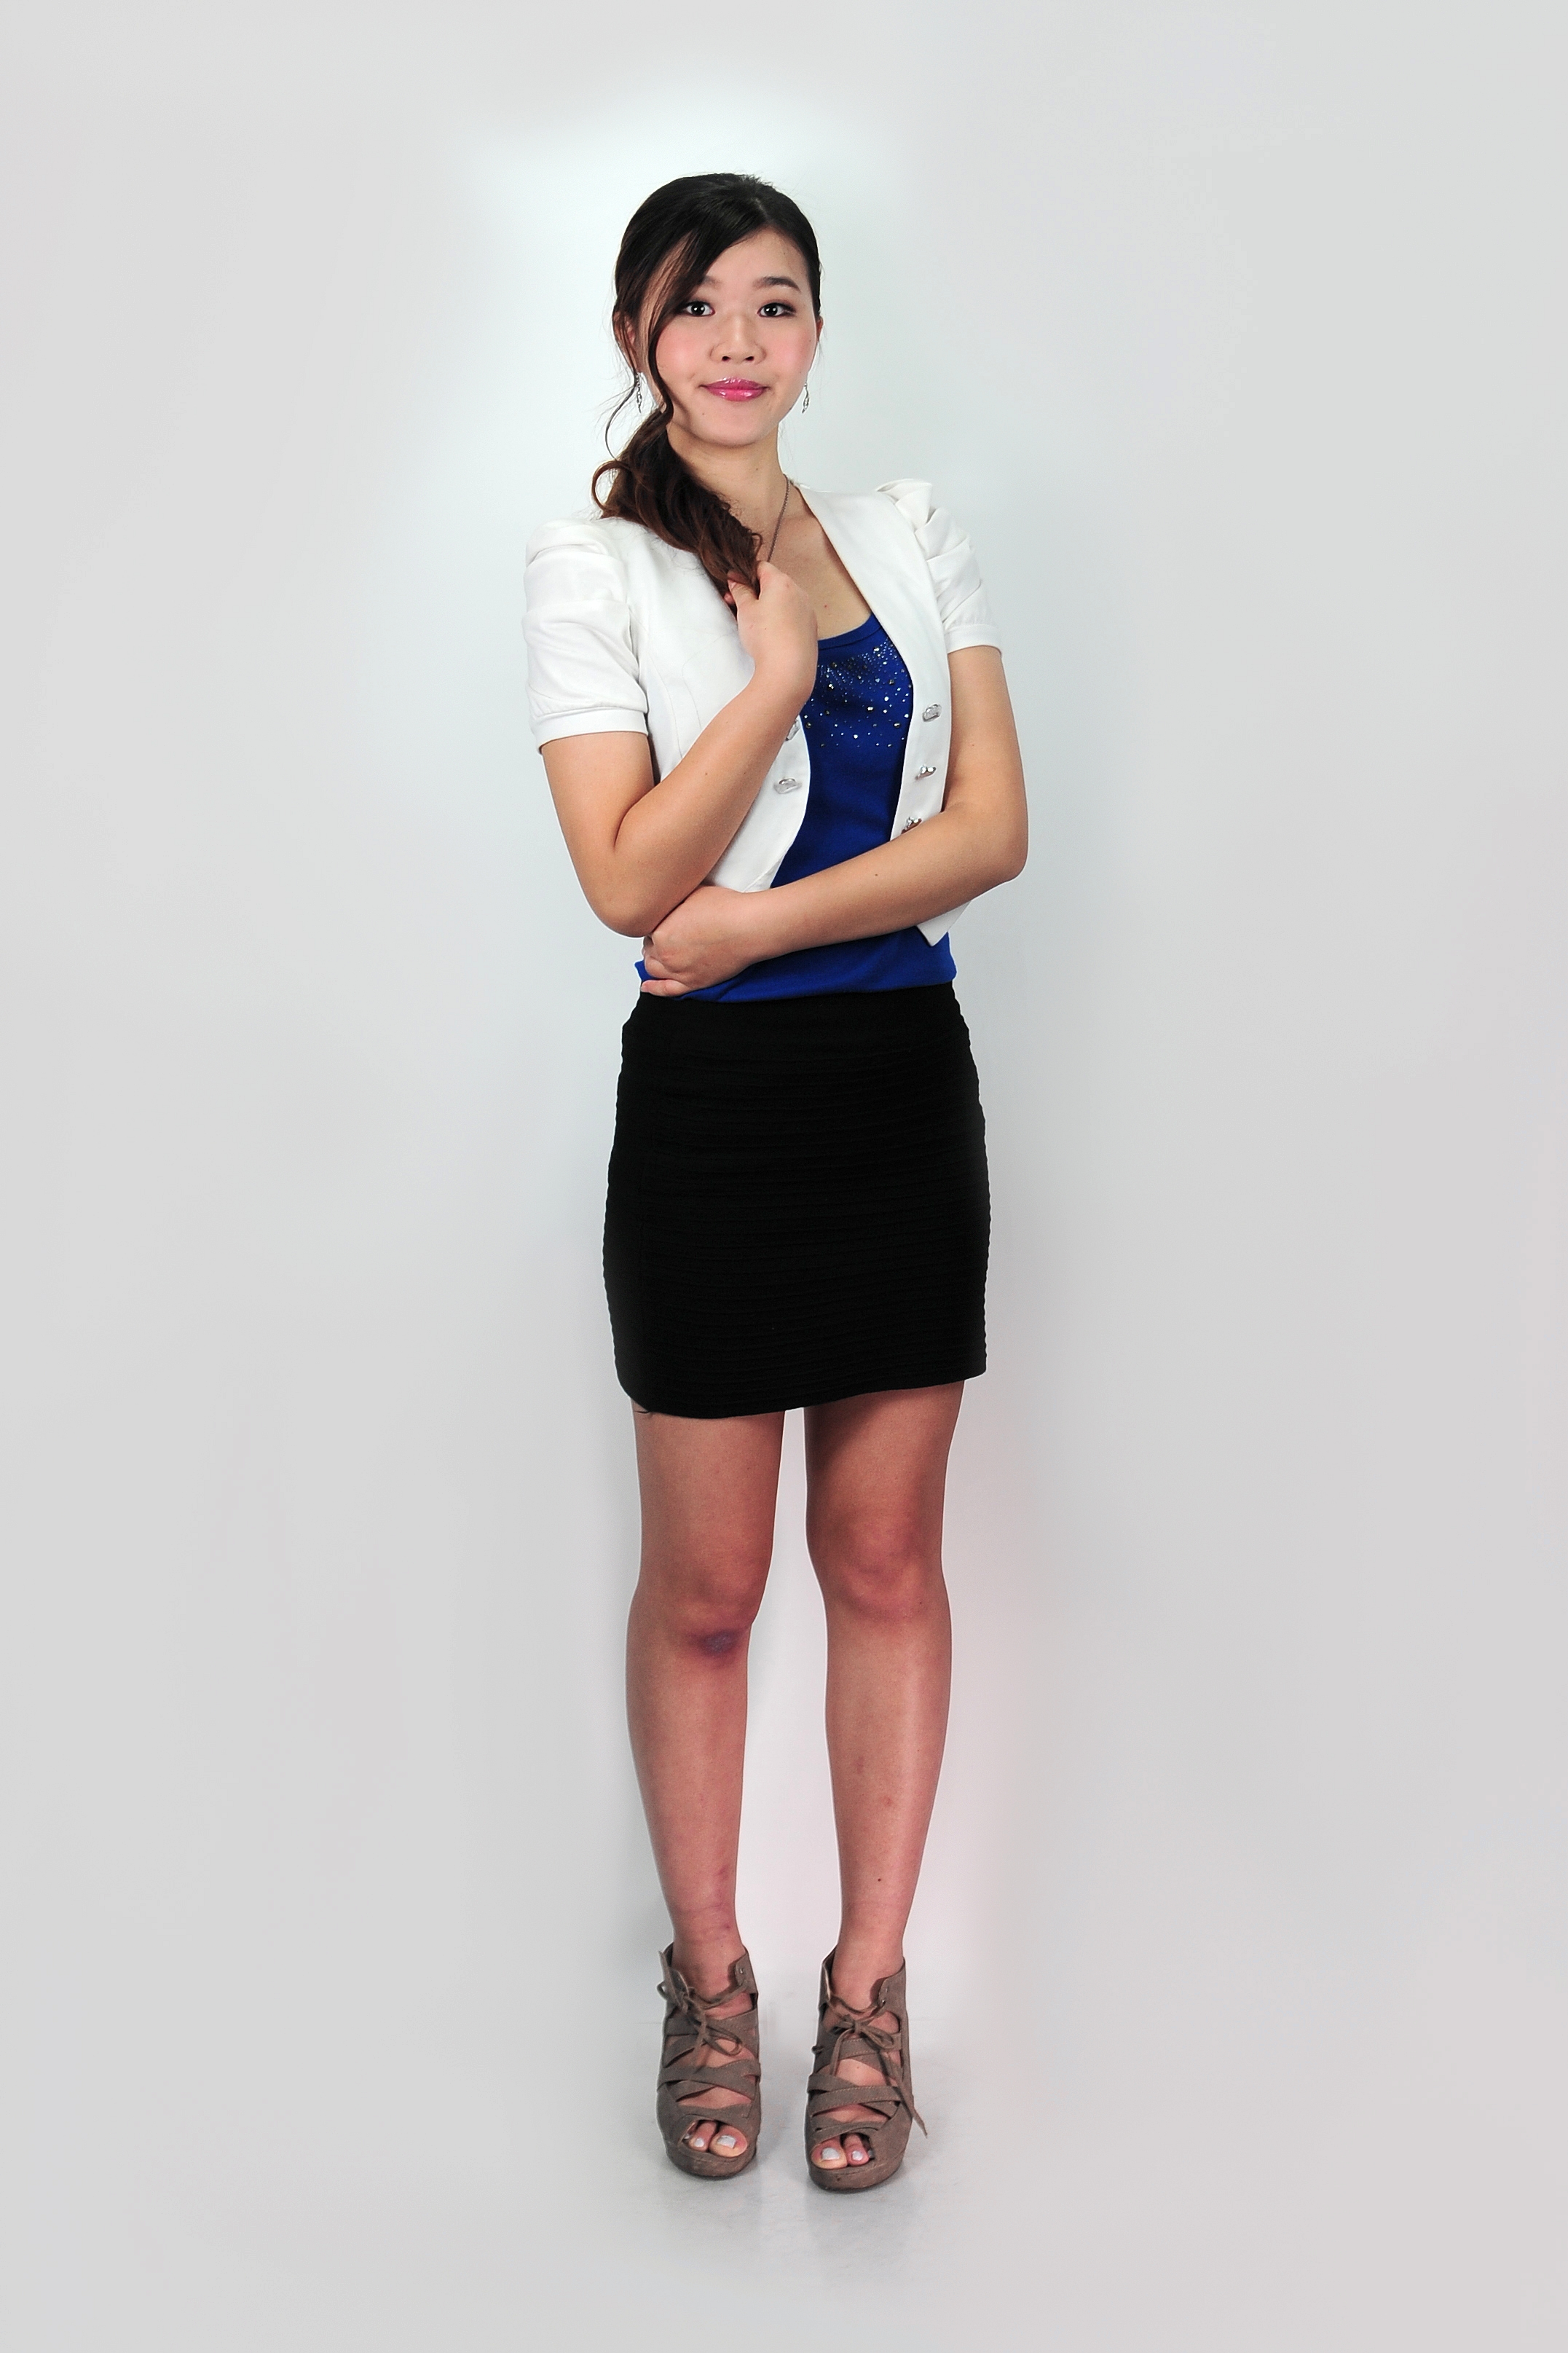 橋星廣告製作有限公司: http://joestar.com.tw/index.php?page=model&pg=34